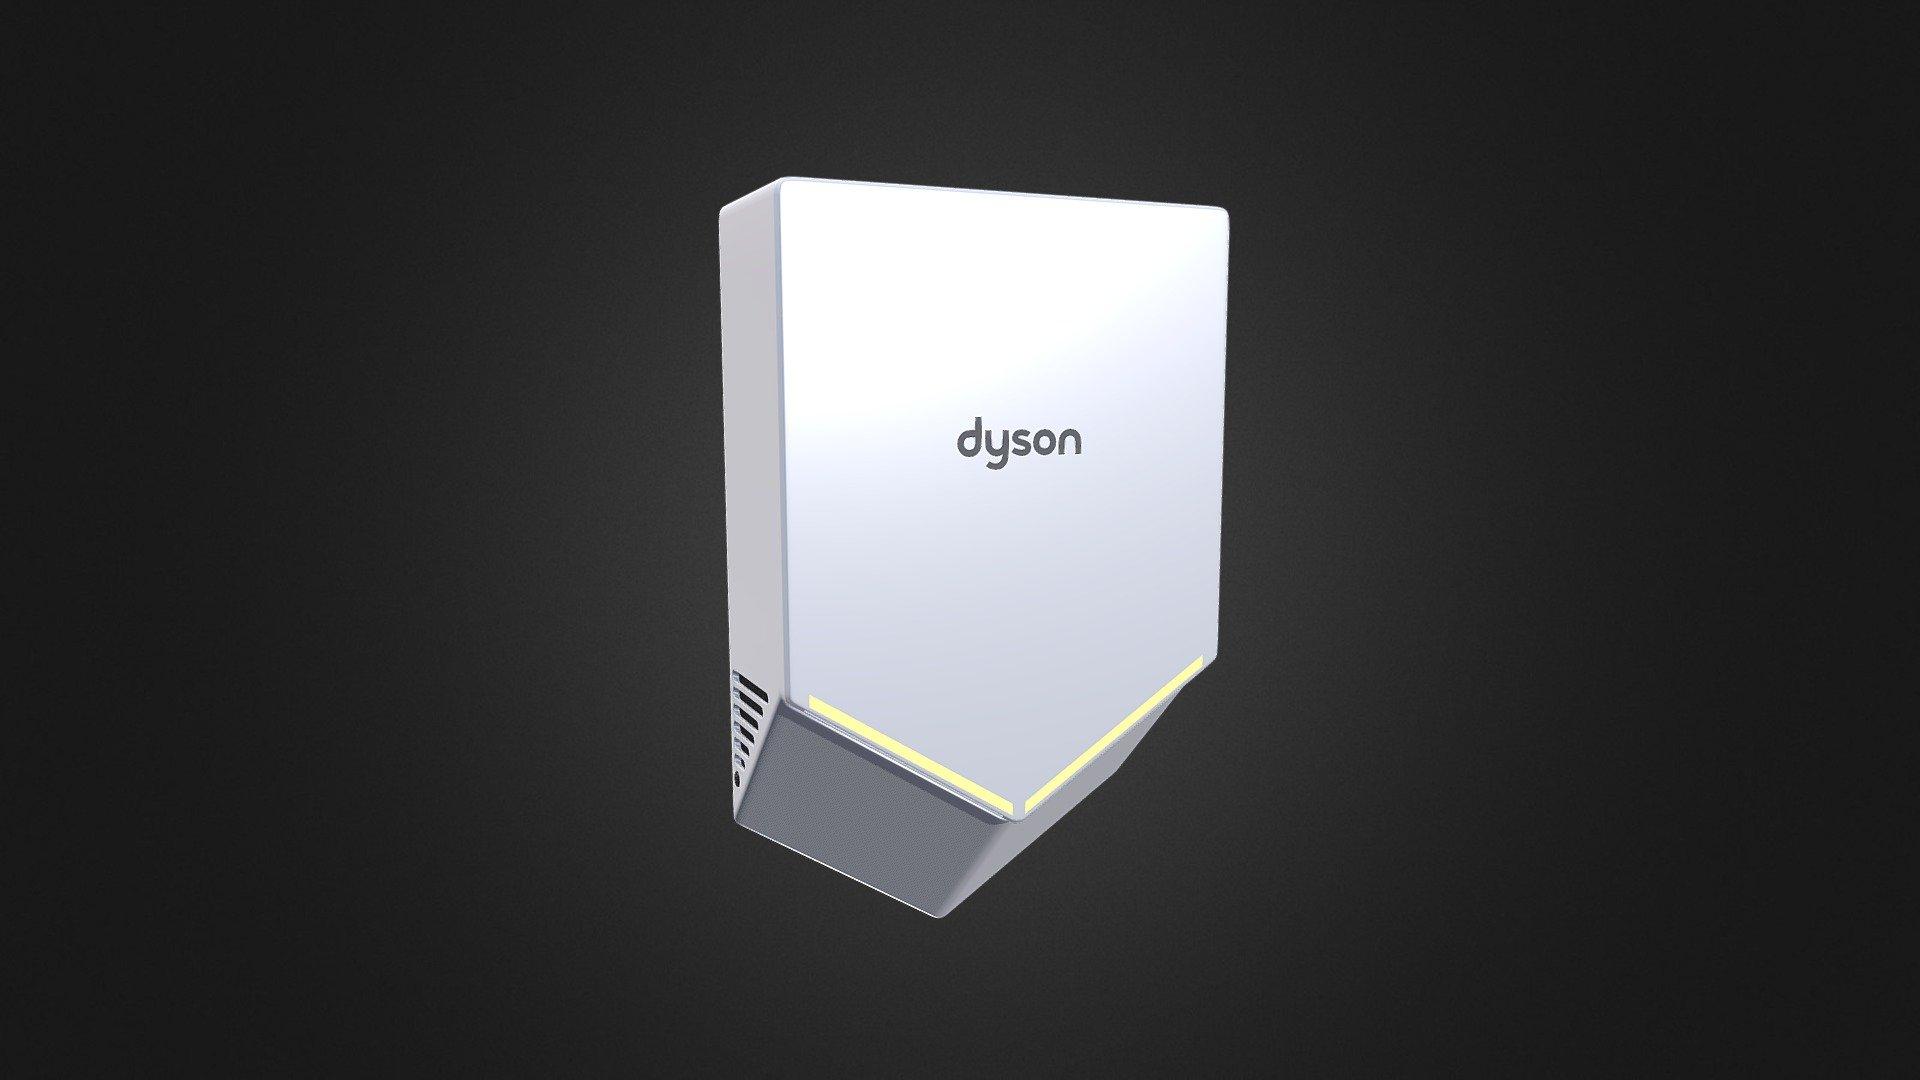 Dyson airblade 3d model дайсон dc34 купить